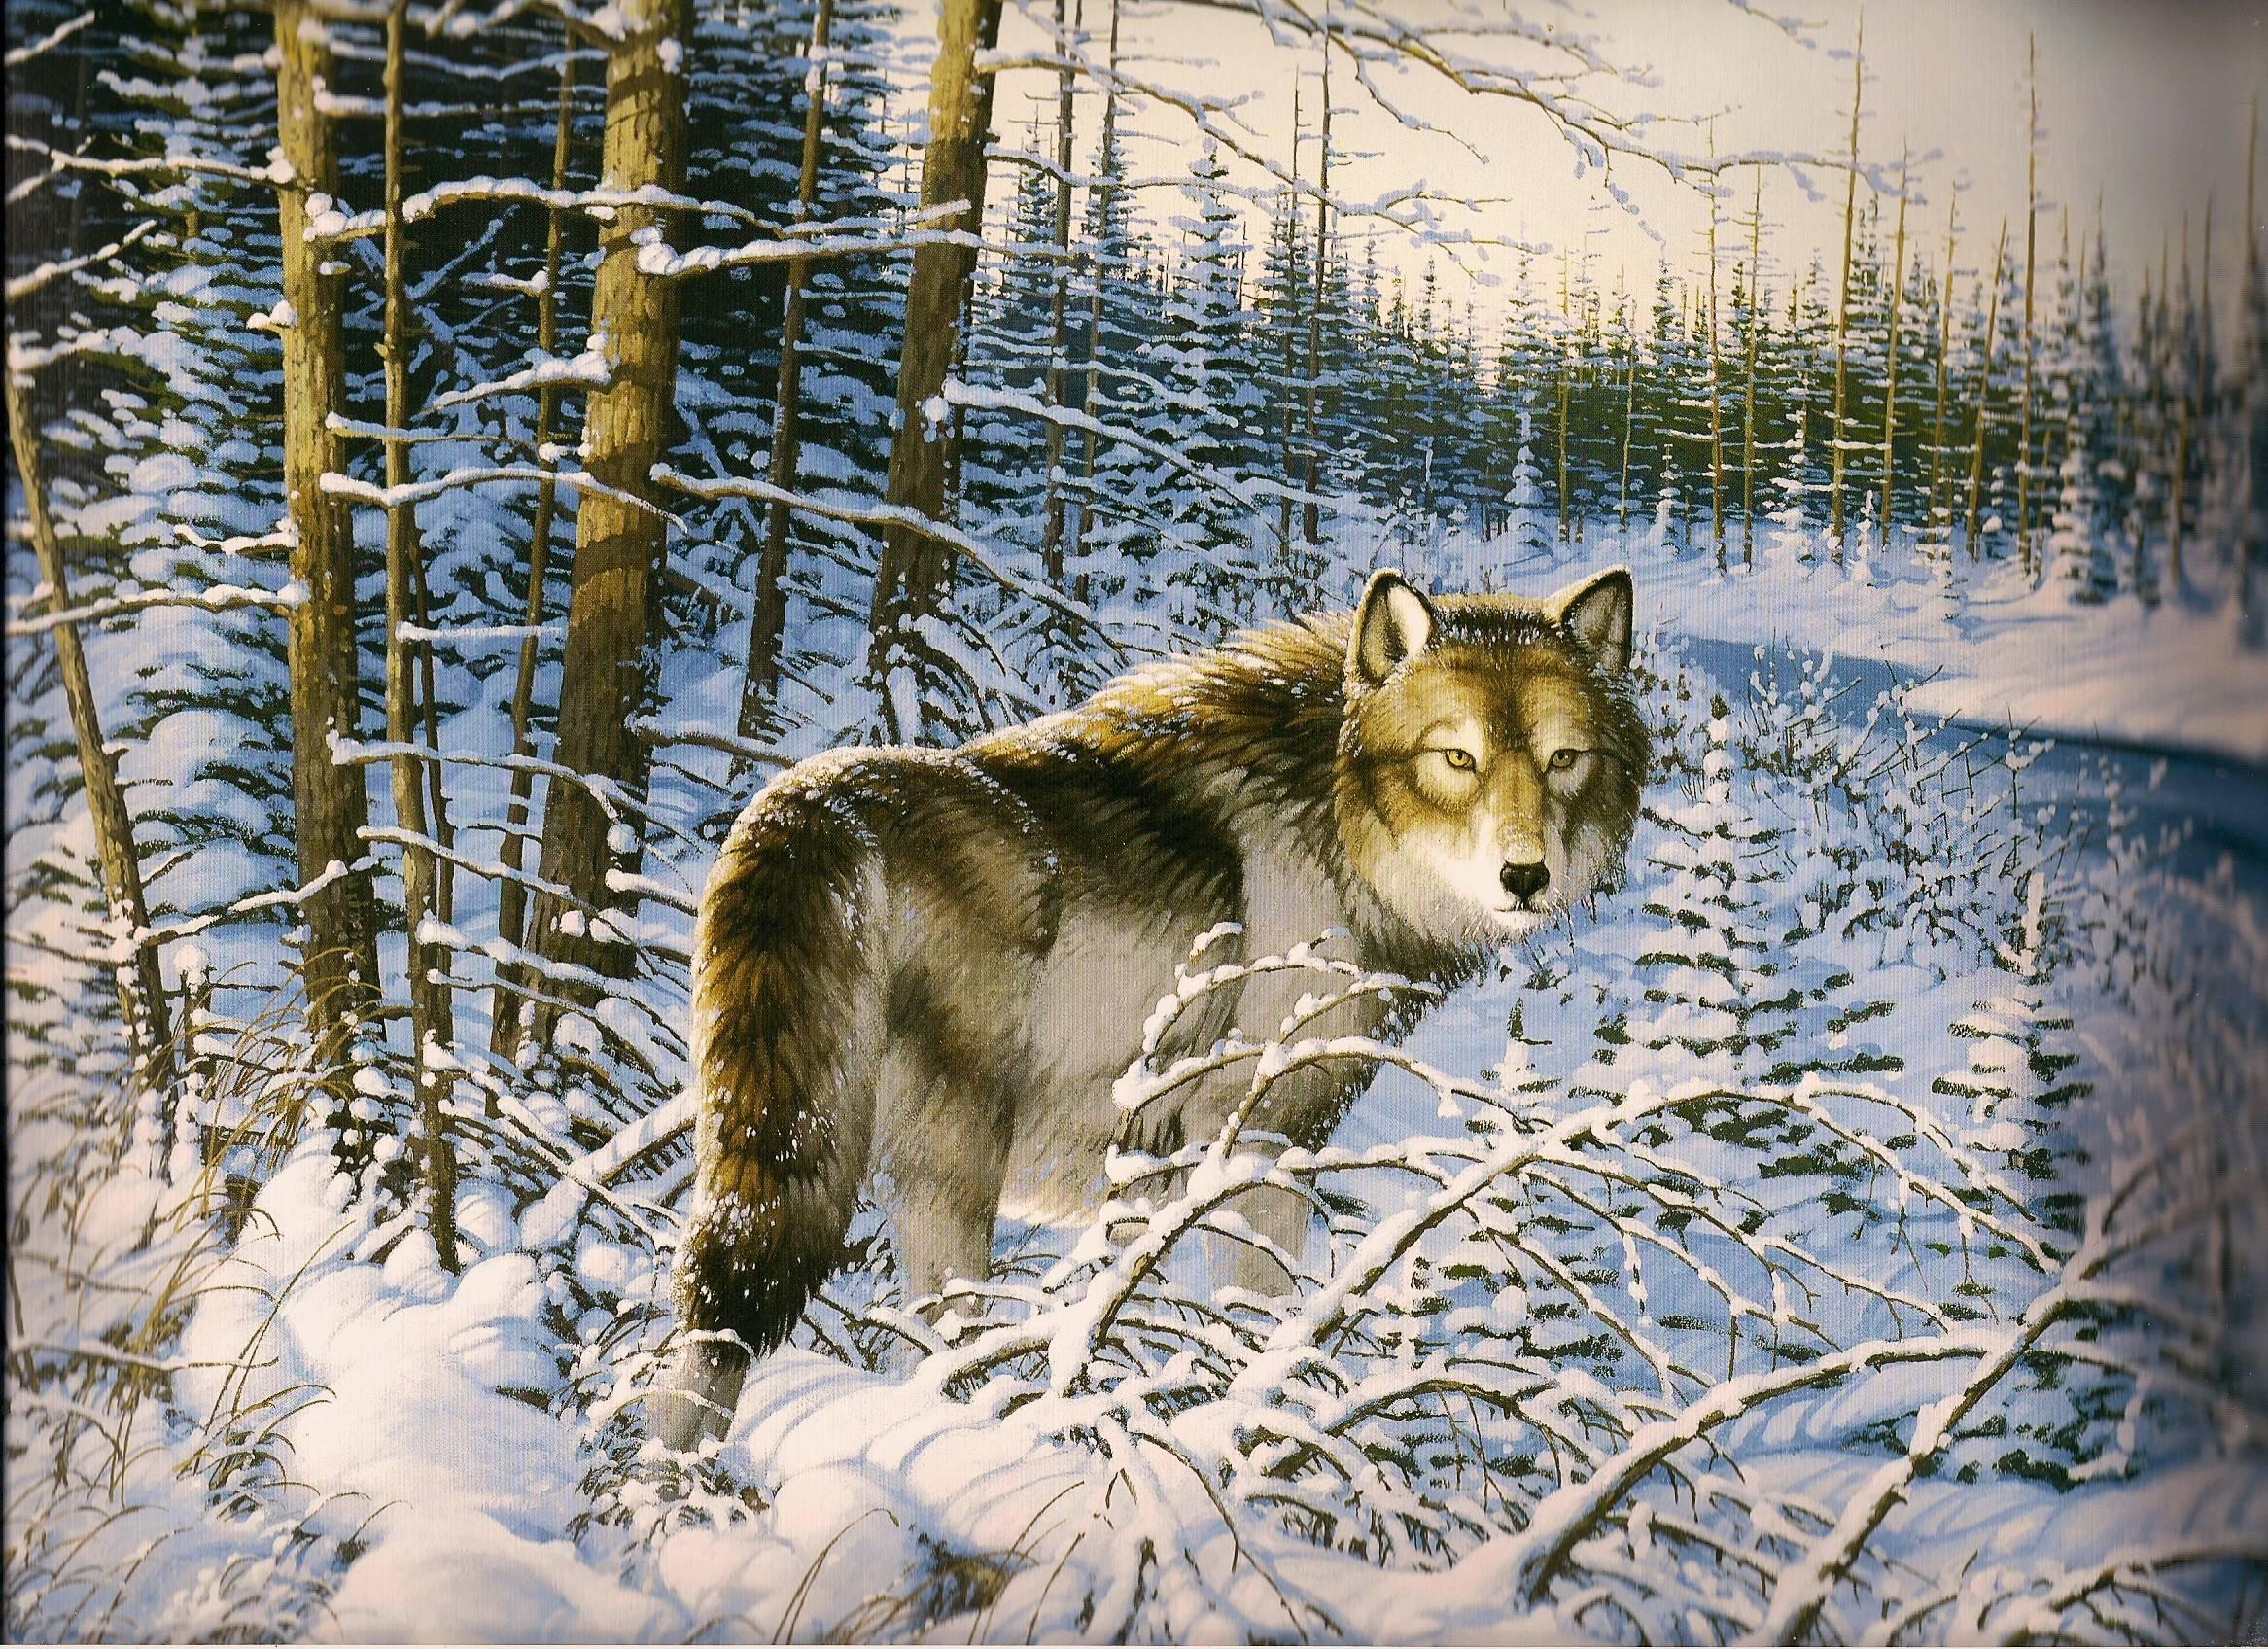 Spirit Animal Wallpapers Wallpaper Cave - Wallpaperzen org